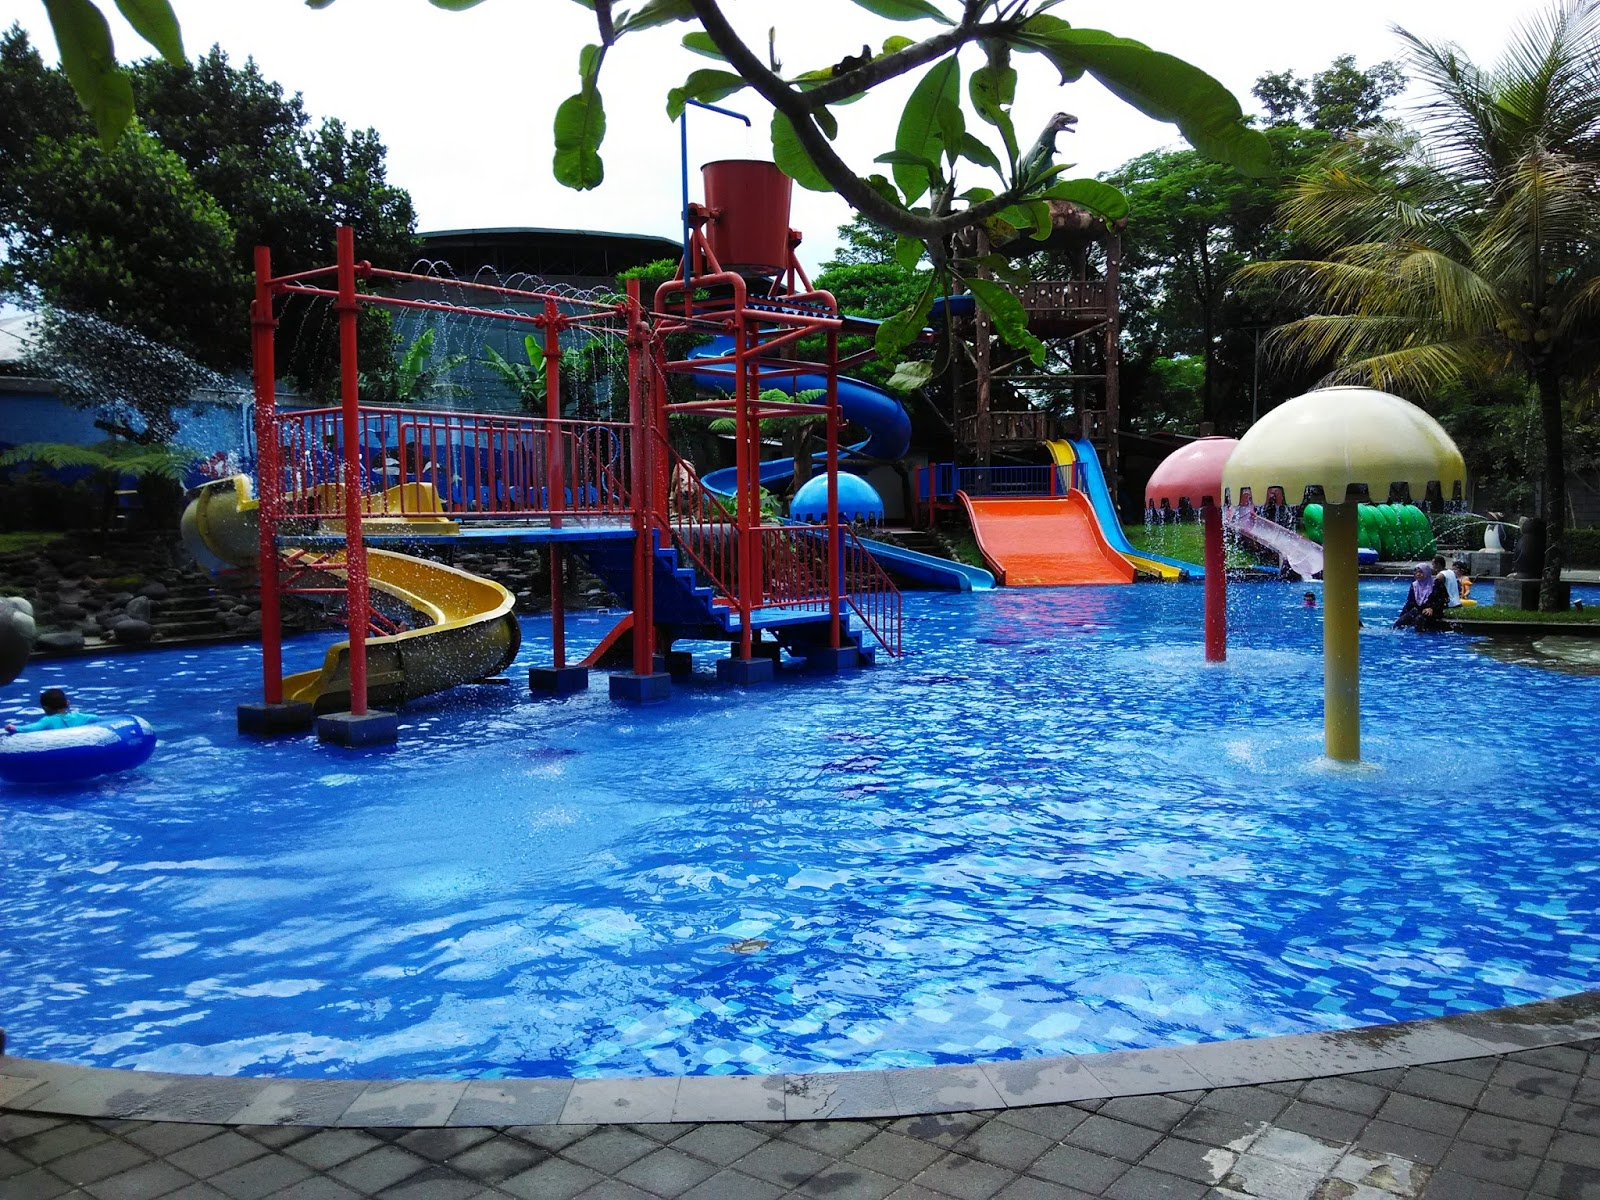 Swimming Pool Oasis : Artsani s siliwangi swimming pool oasis